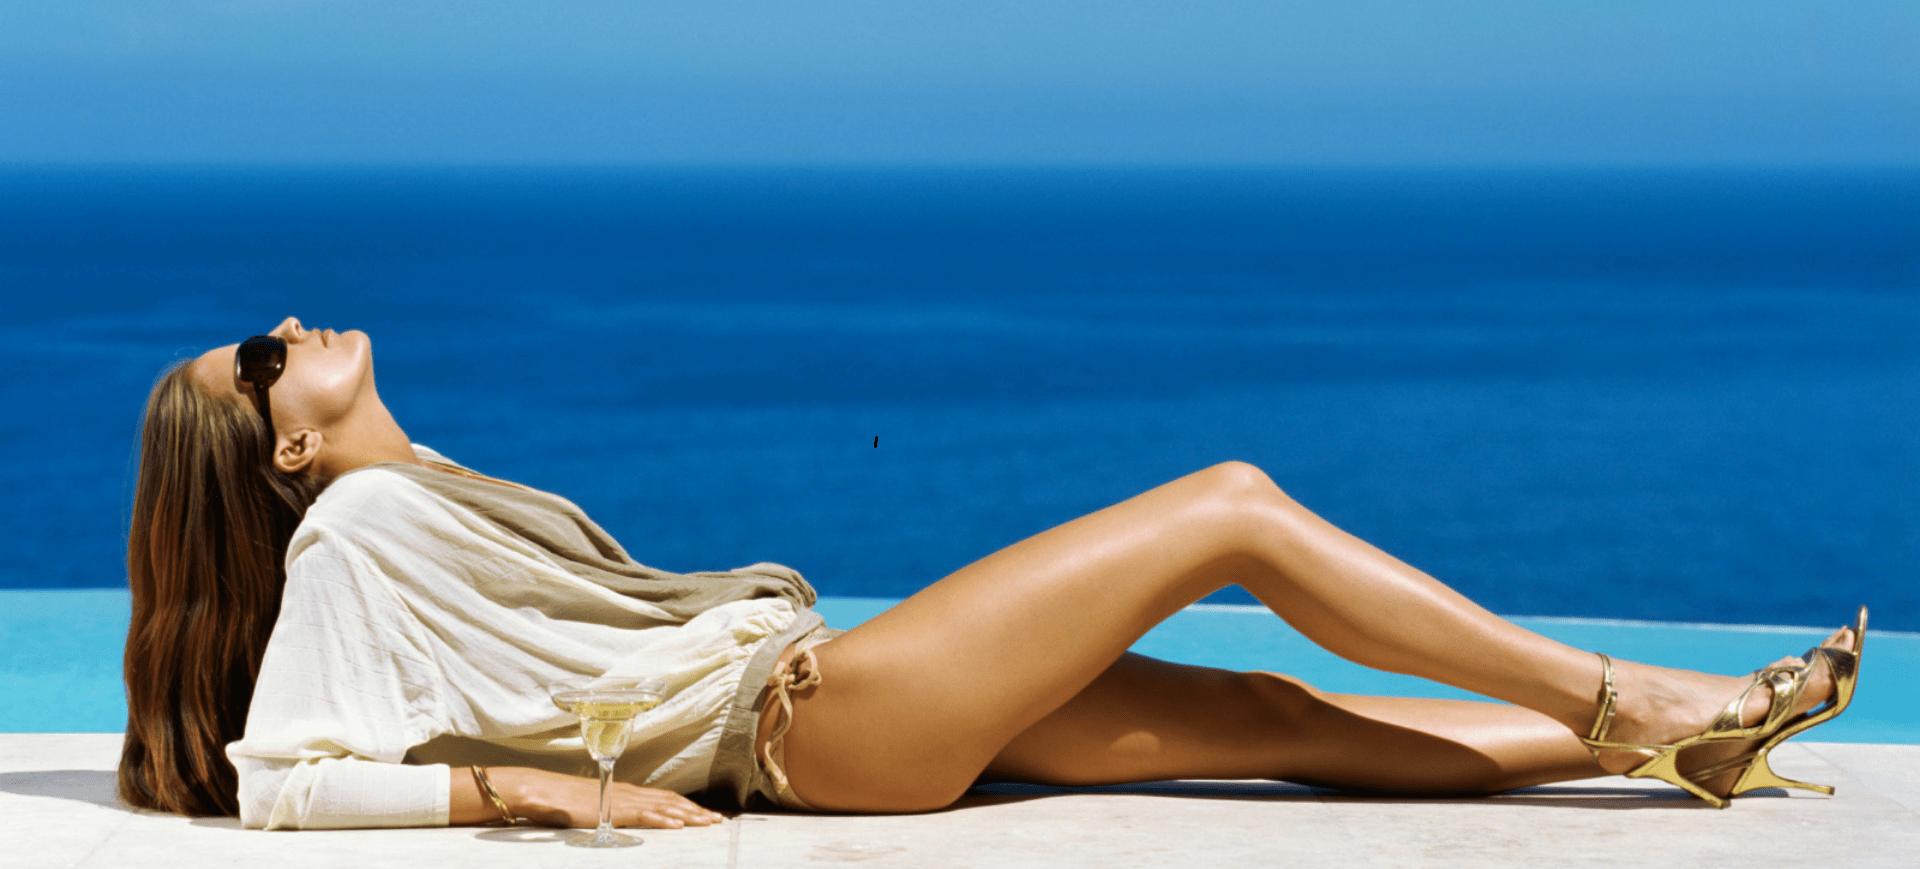 escort model at the infinity pool